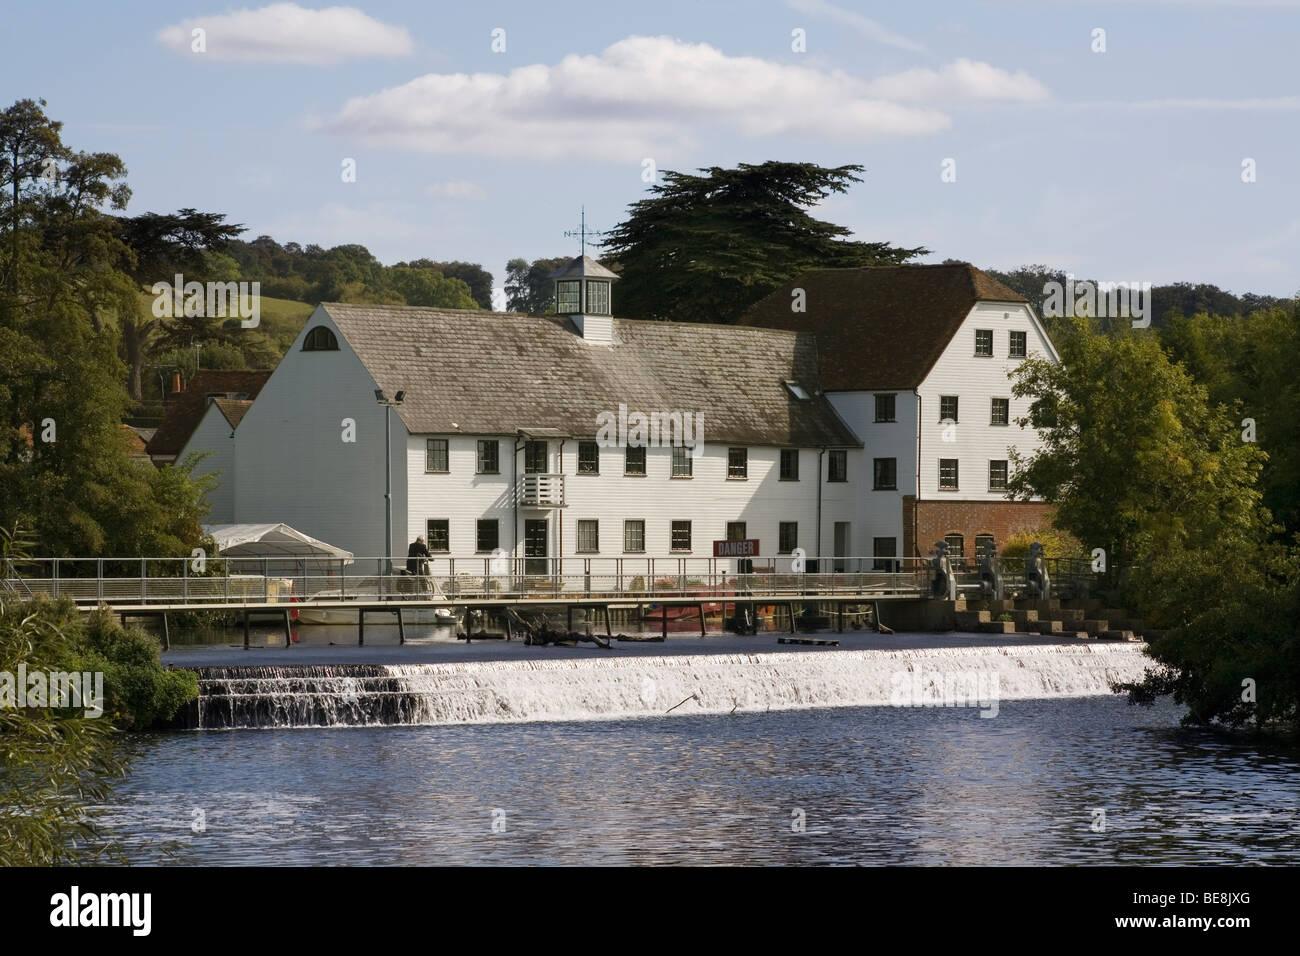 England Buckinghamshire Hambleden Mill & River Thames - Stock Image